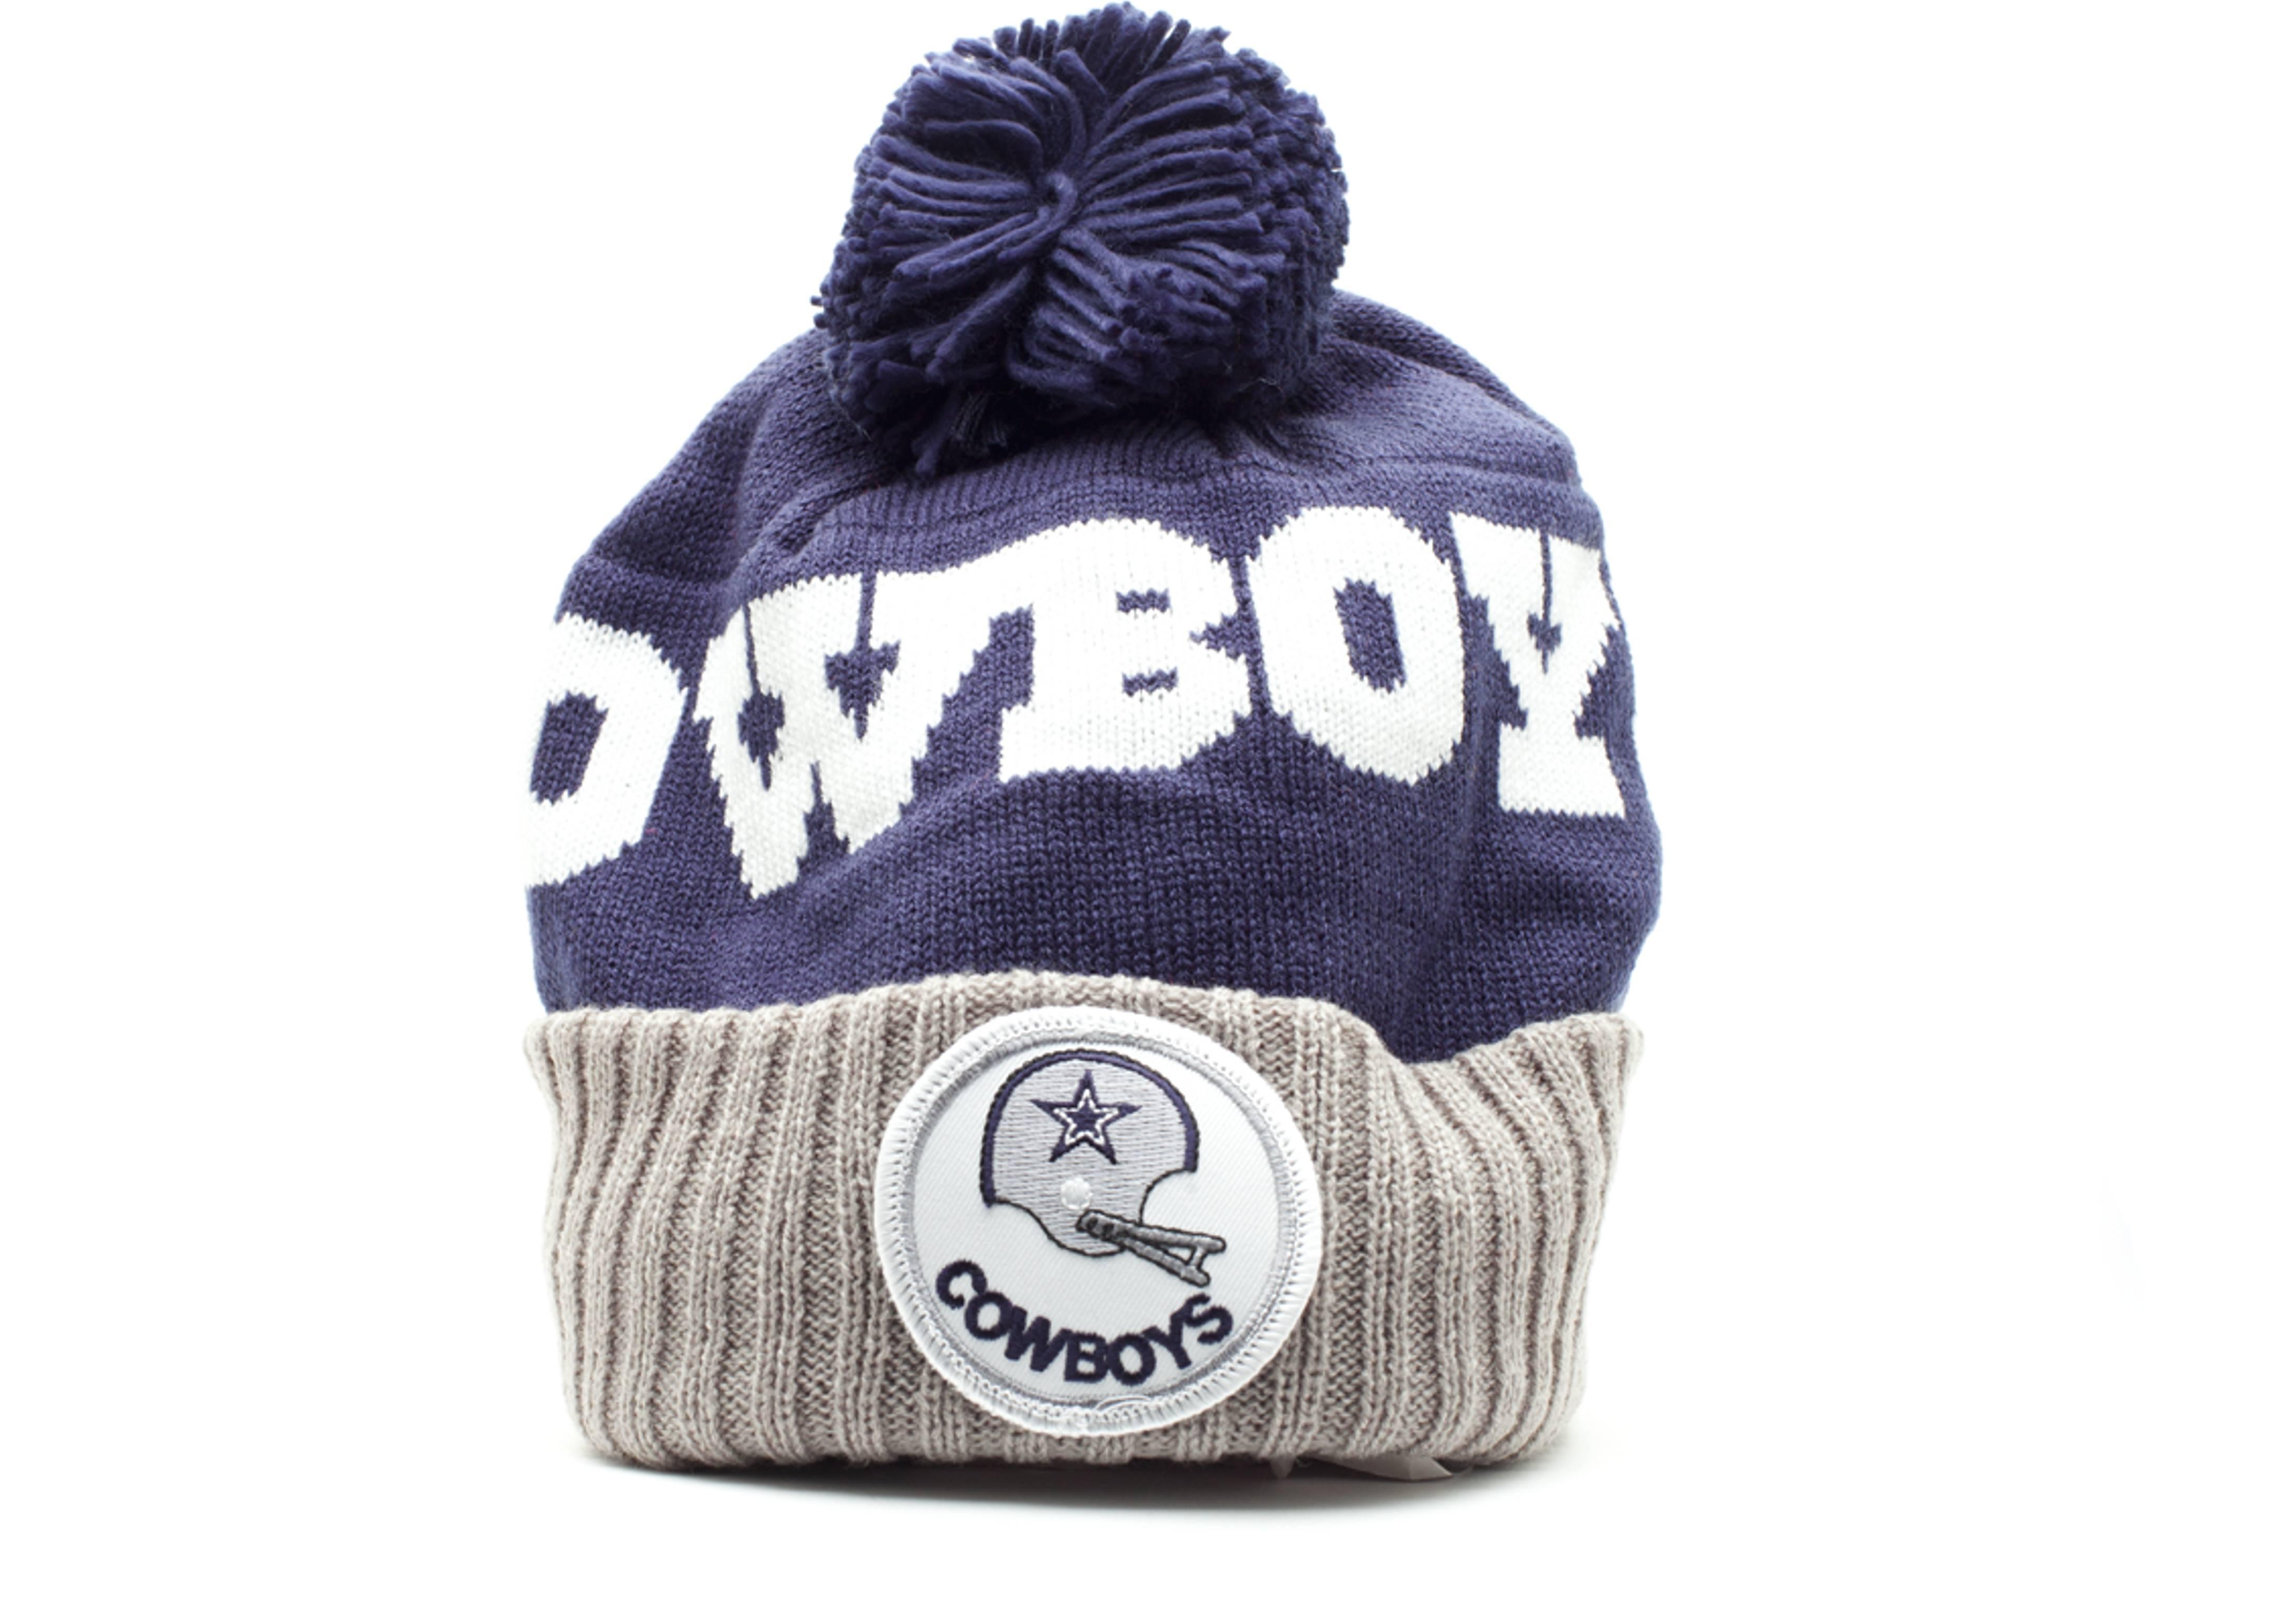 2d388915 Dallas Cowboys Cuffed Pom Knit Beanie - Mitchell & Ness ...